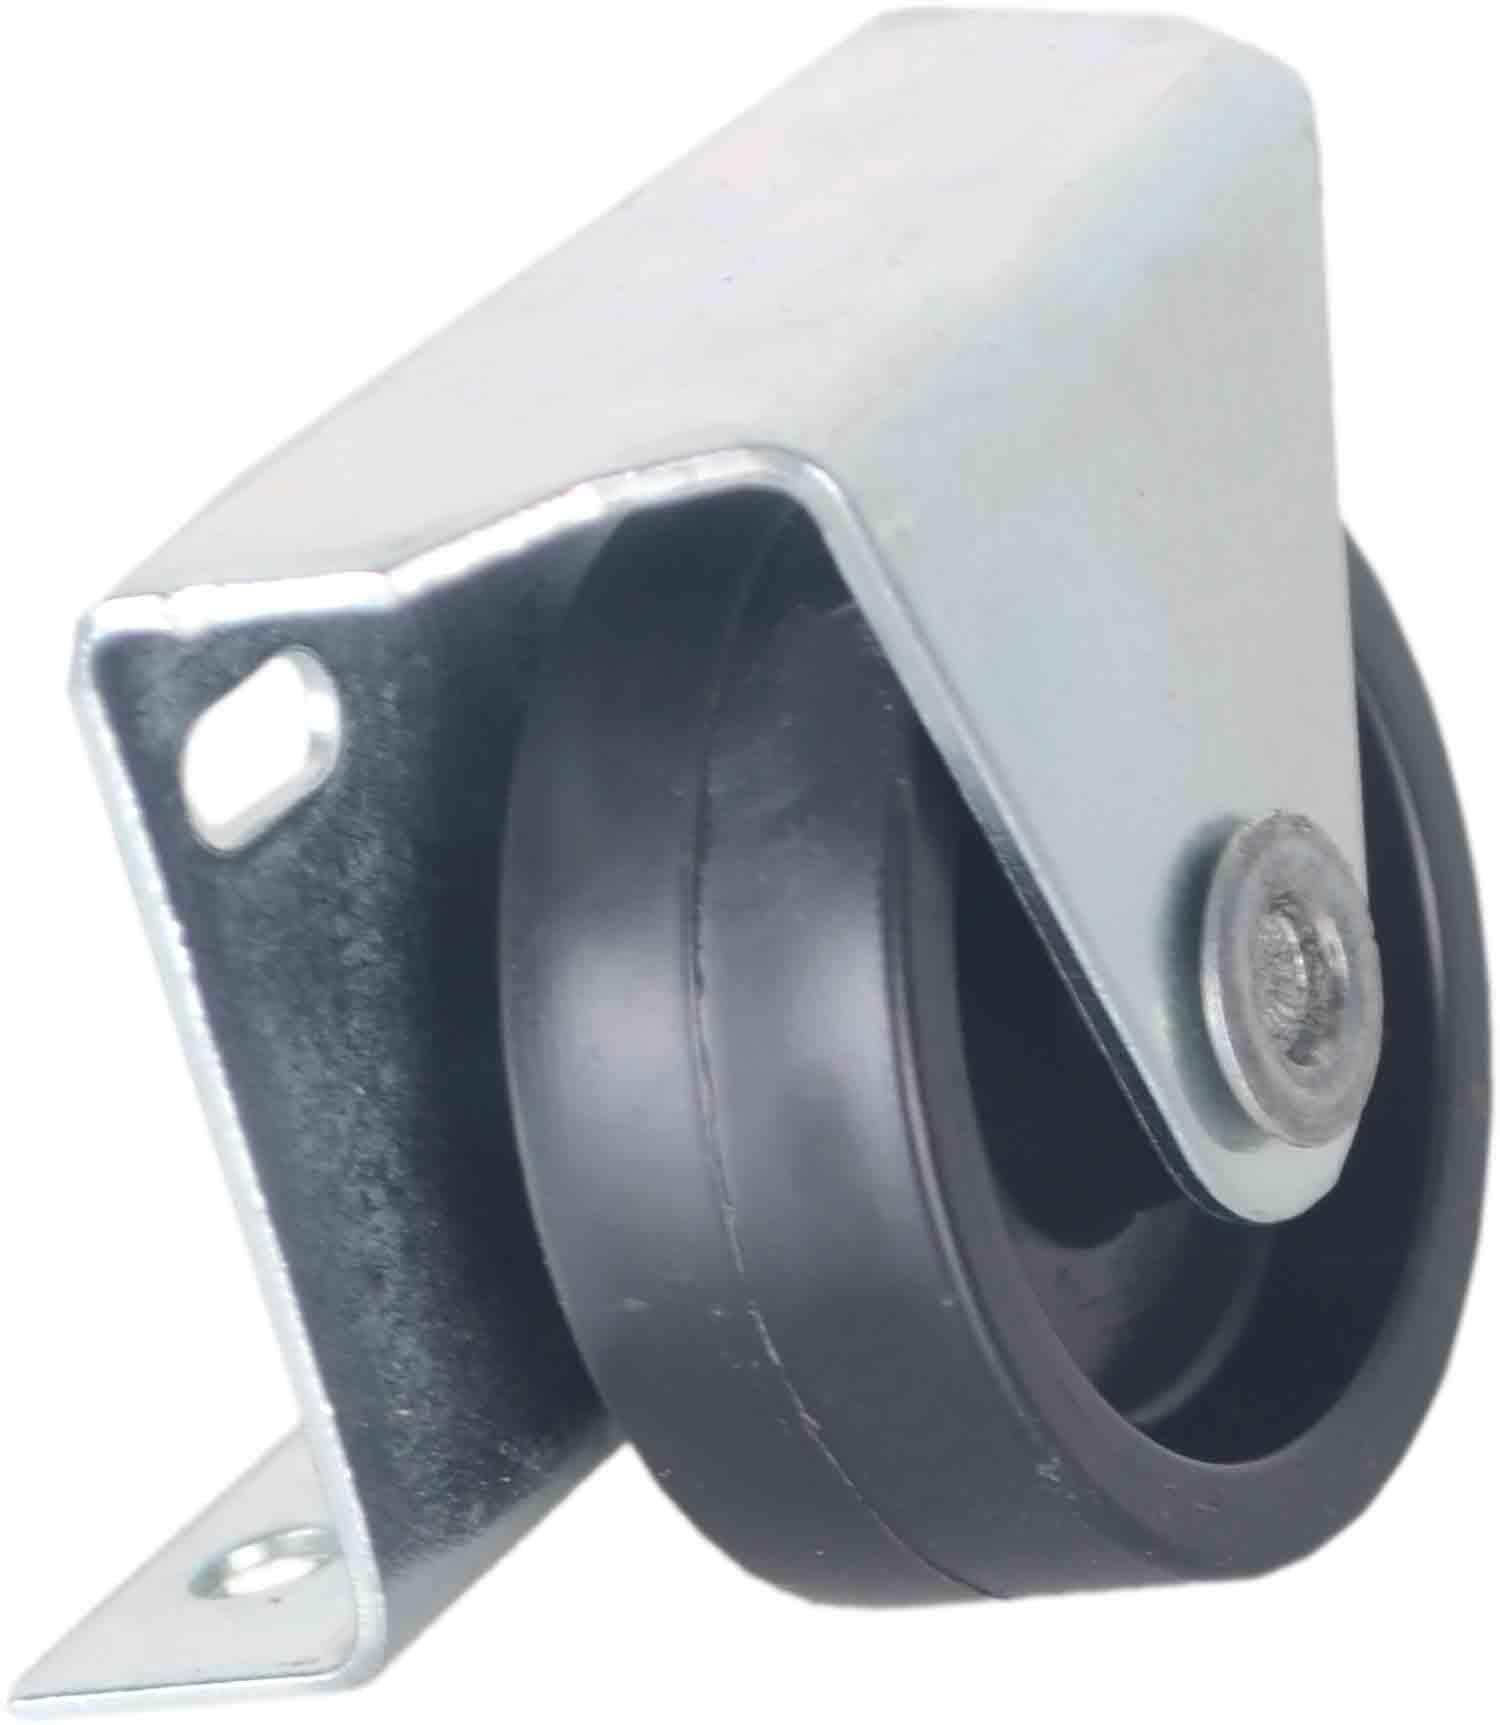 10 Roda Rodízio Fixo Chapa L 36mm 50kg (Cama auxiliar)